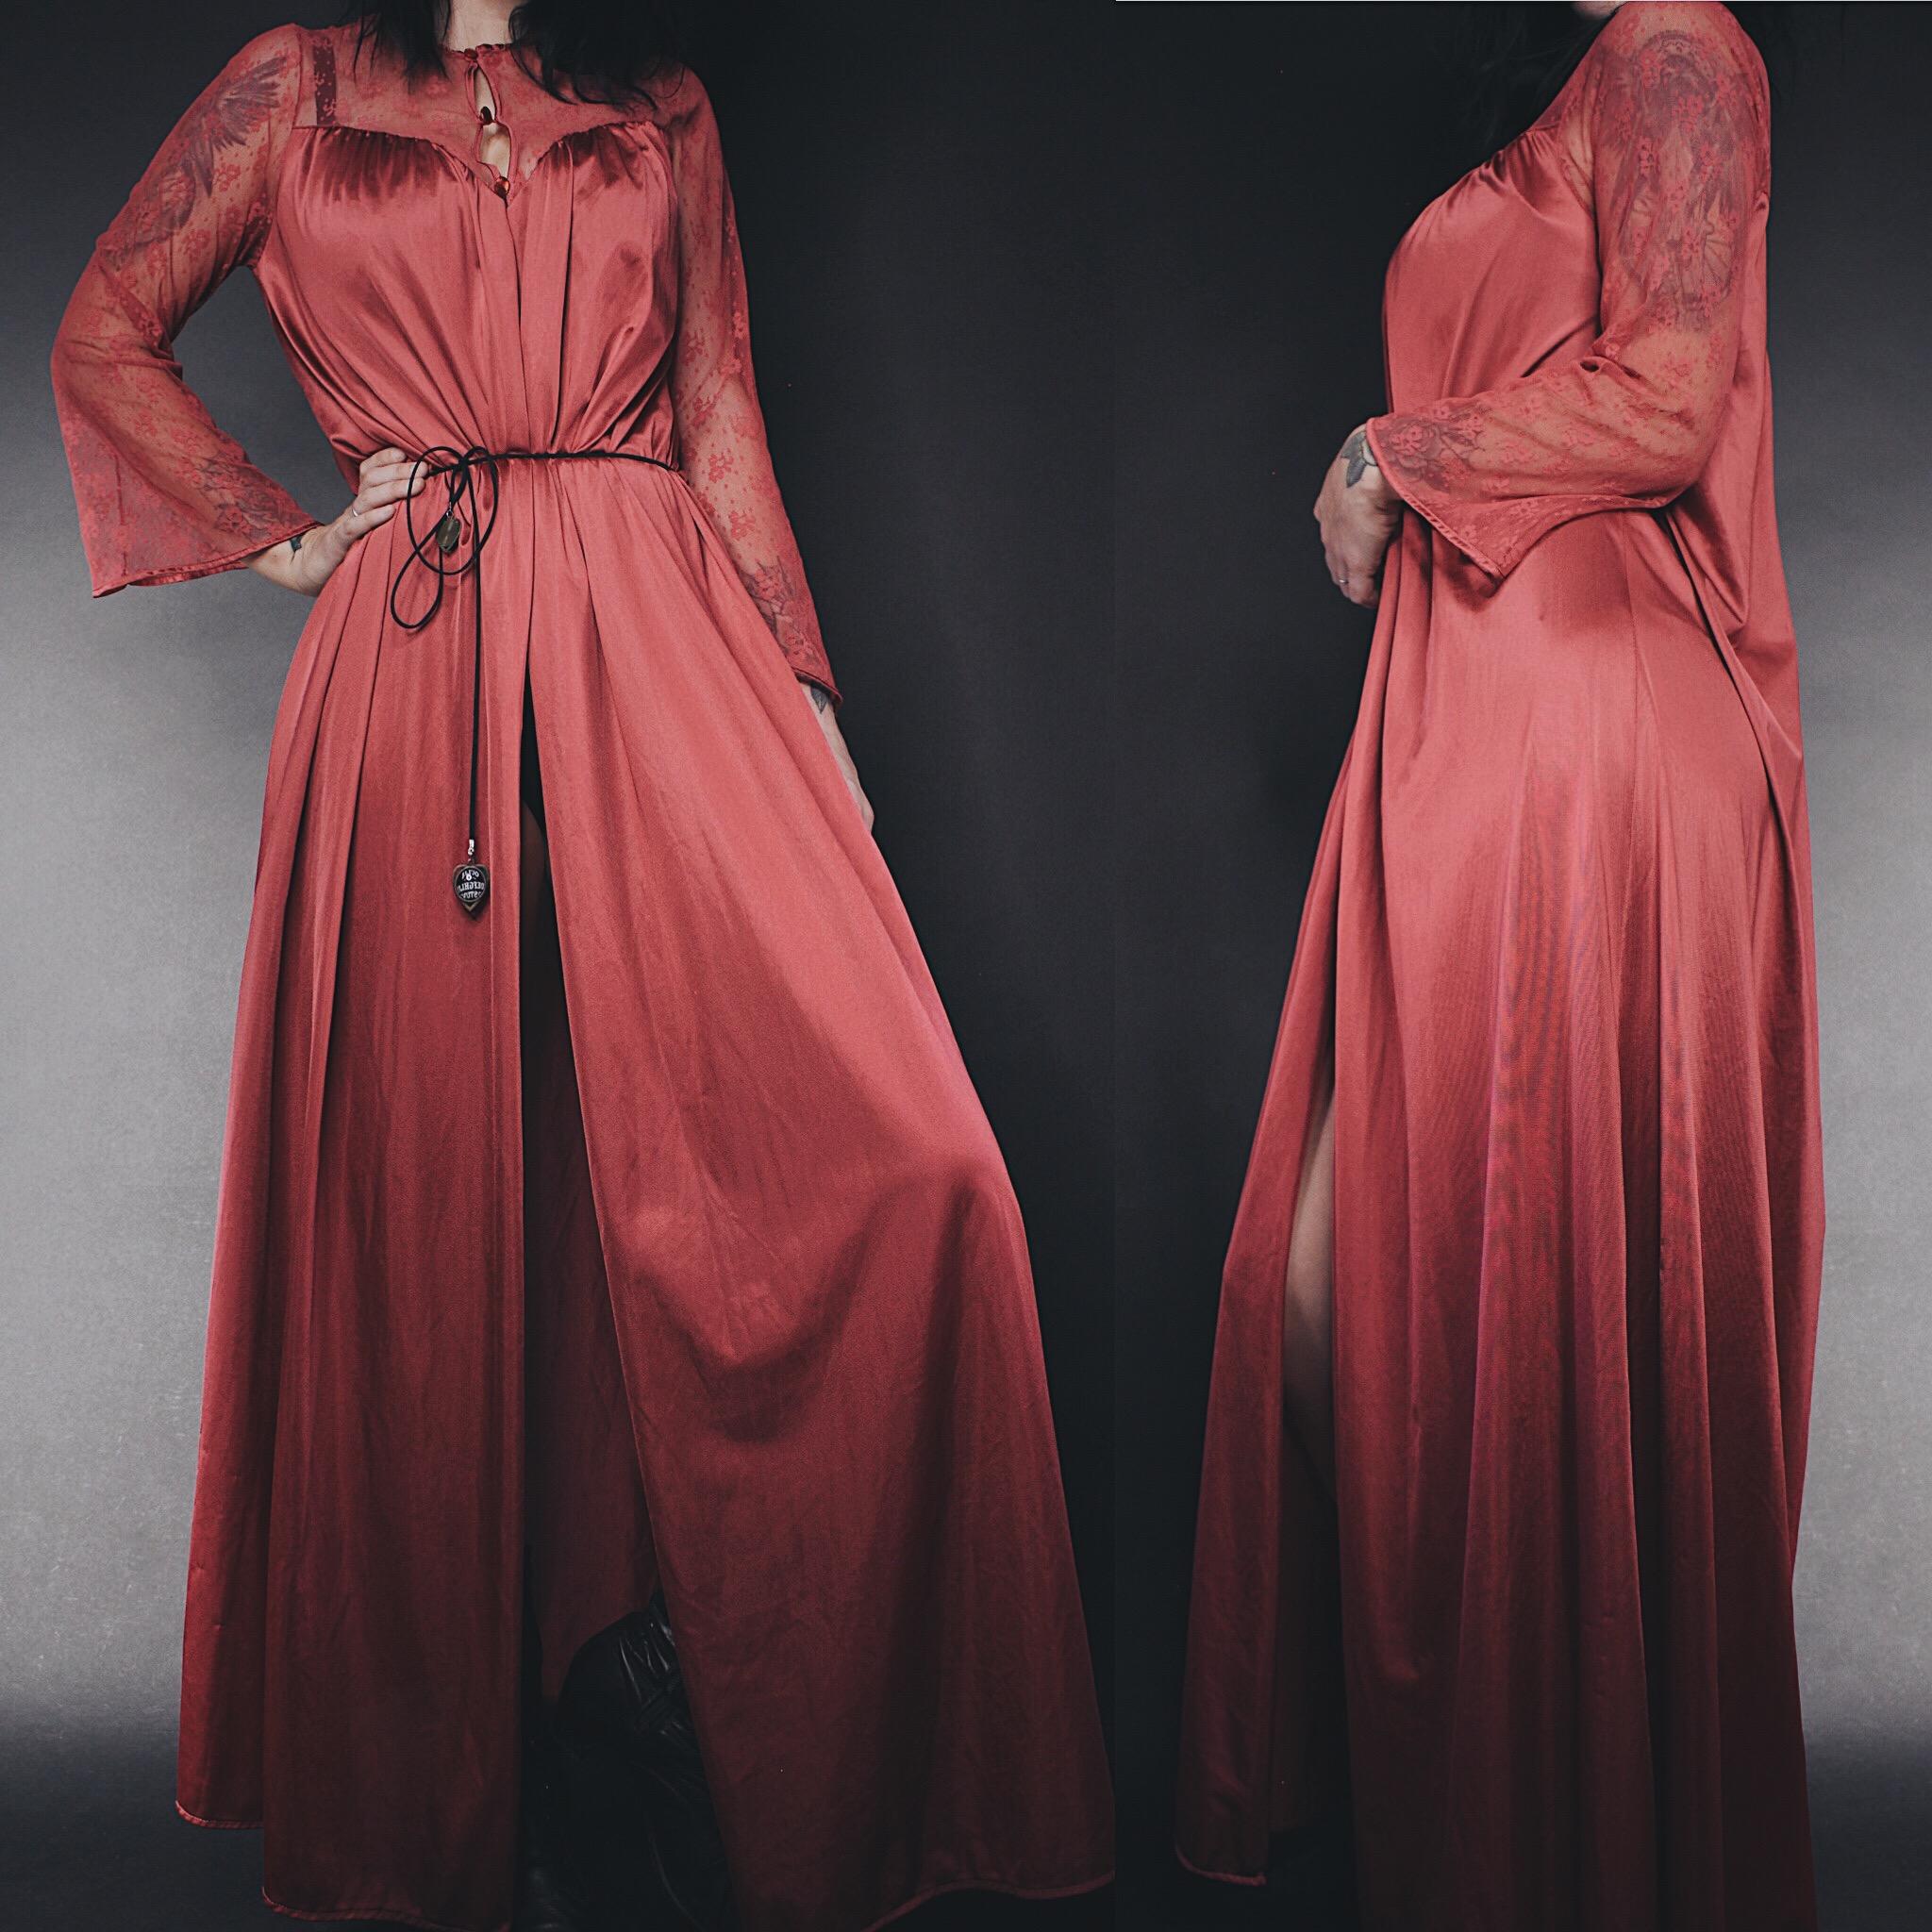 Vintage 80s Raspberry Satin   Lace Dressing Gown · Last Rites ... db6b9d768